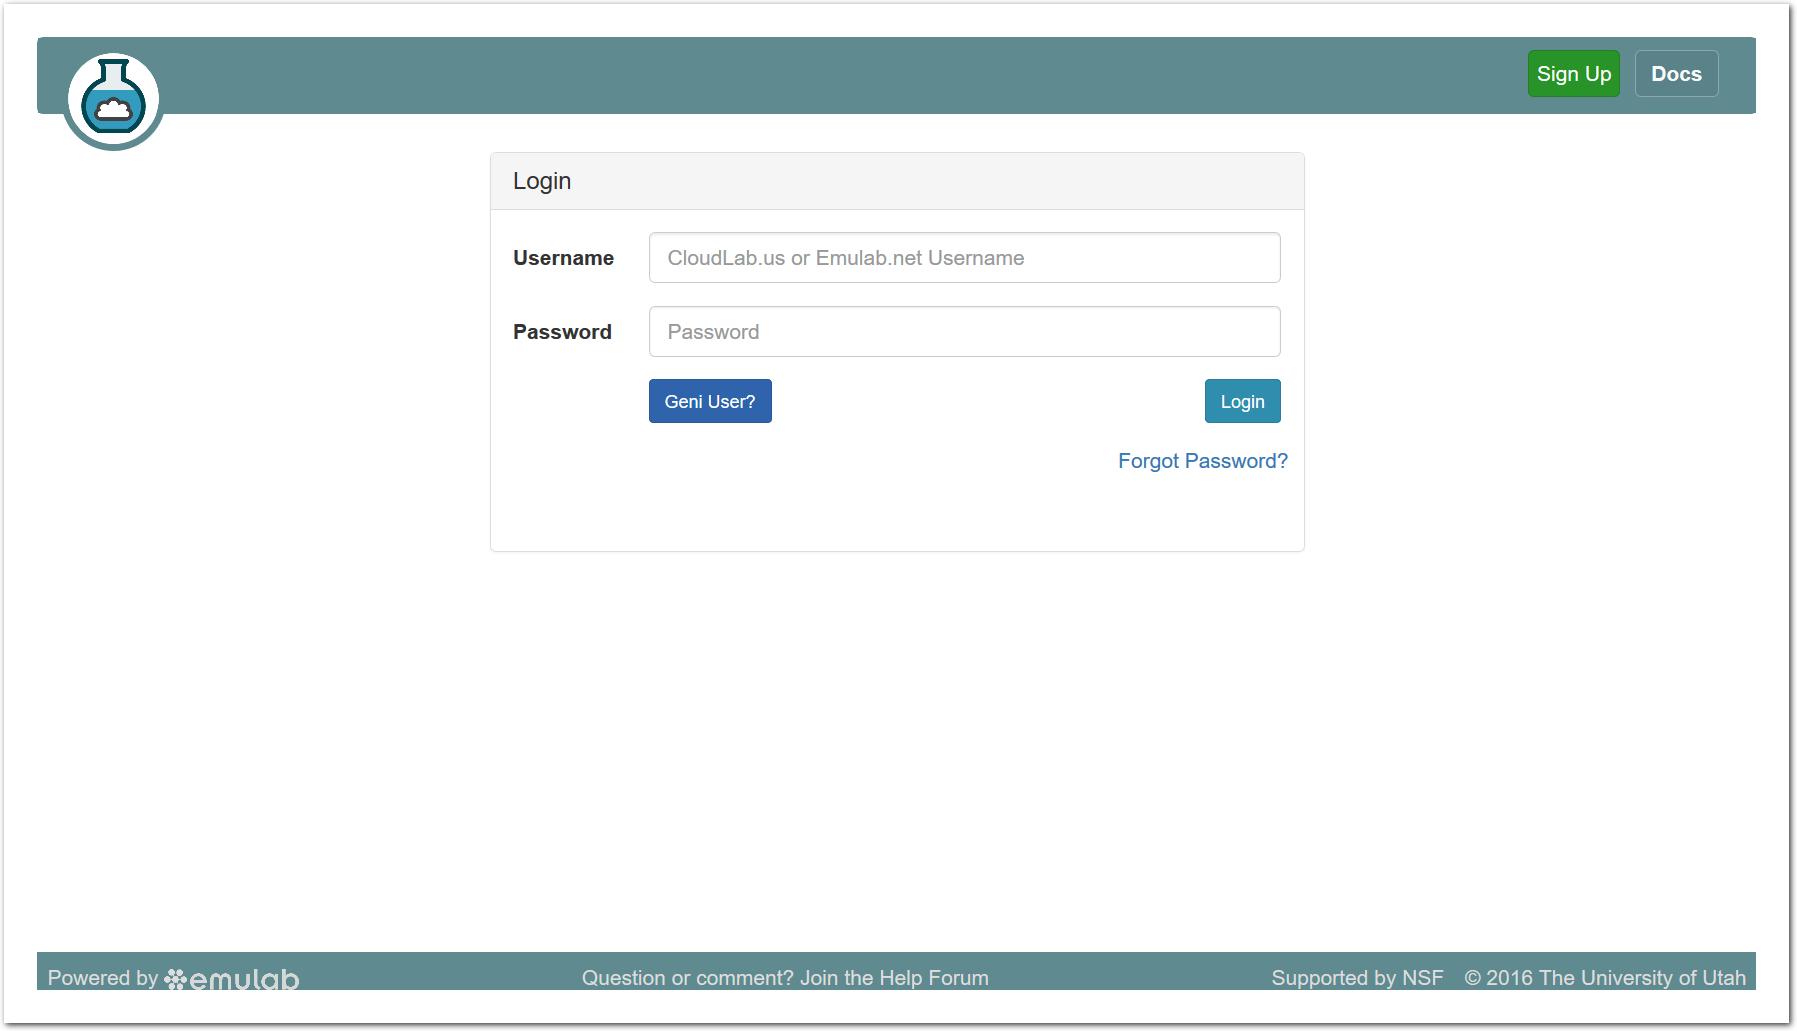 screenshots/apt/log-in.png